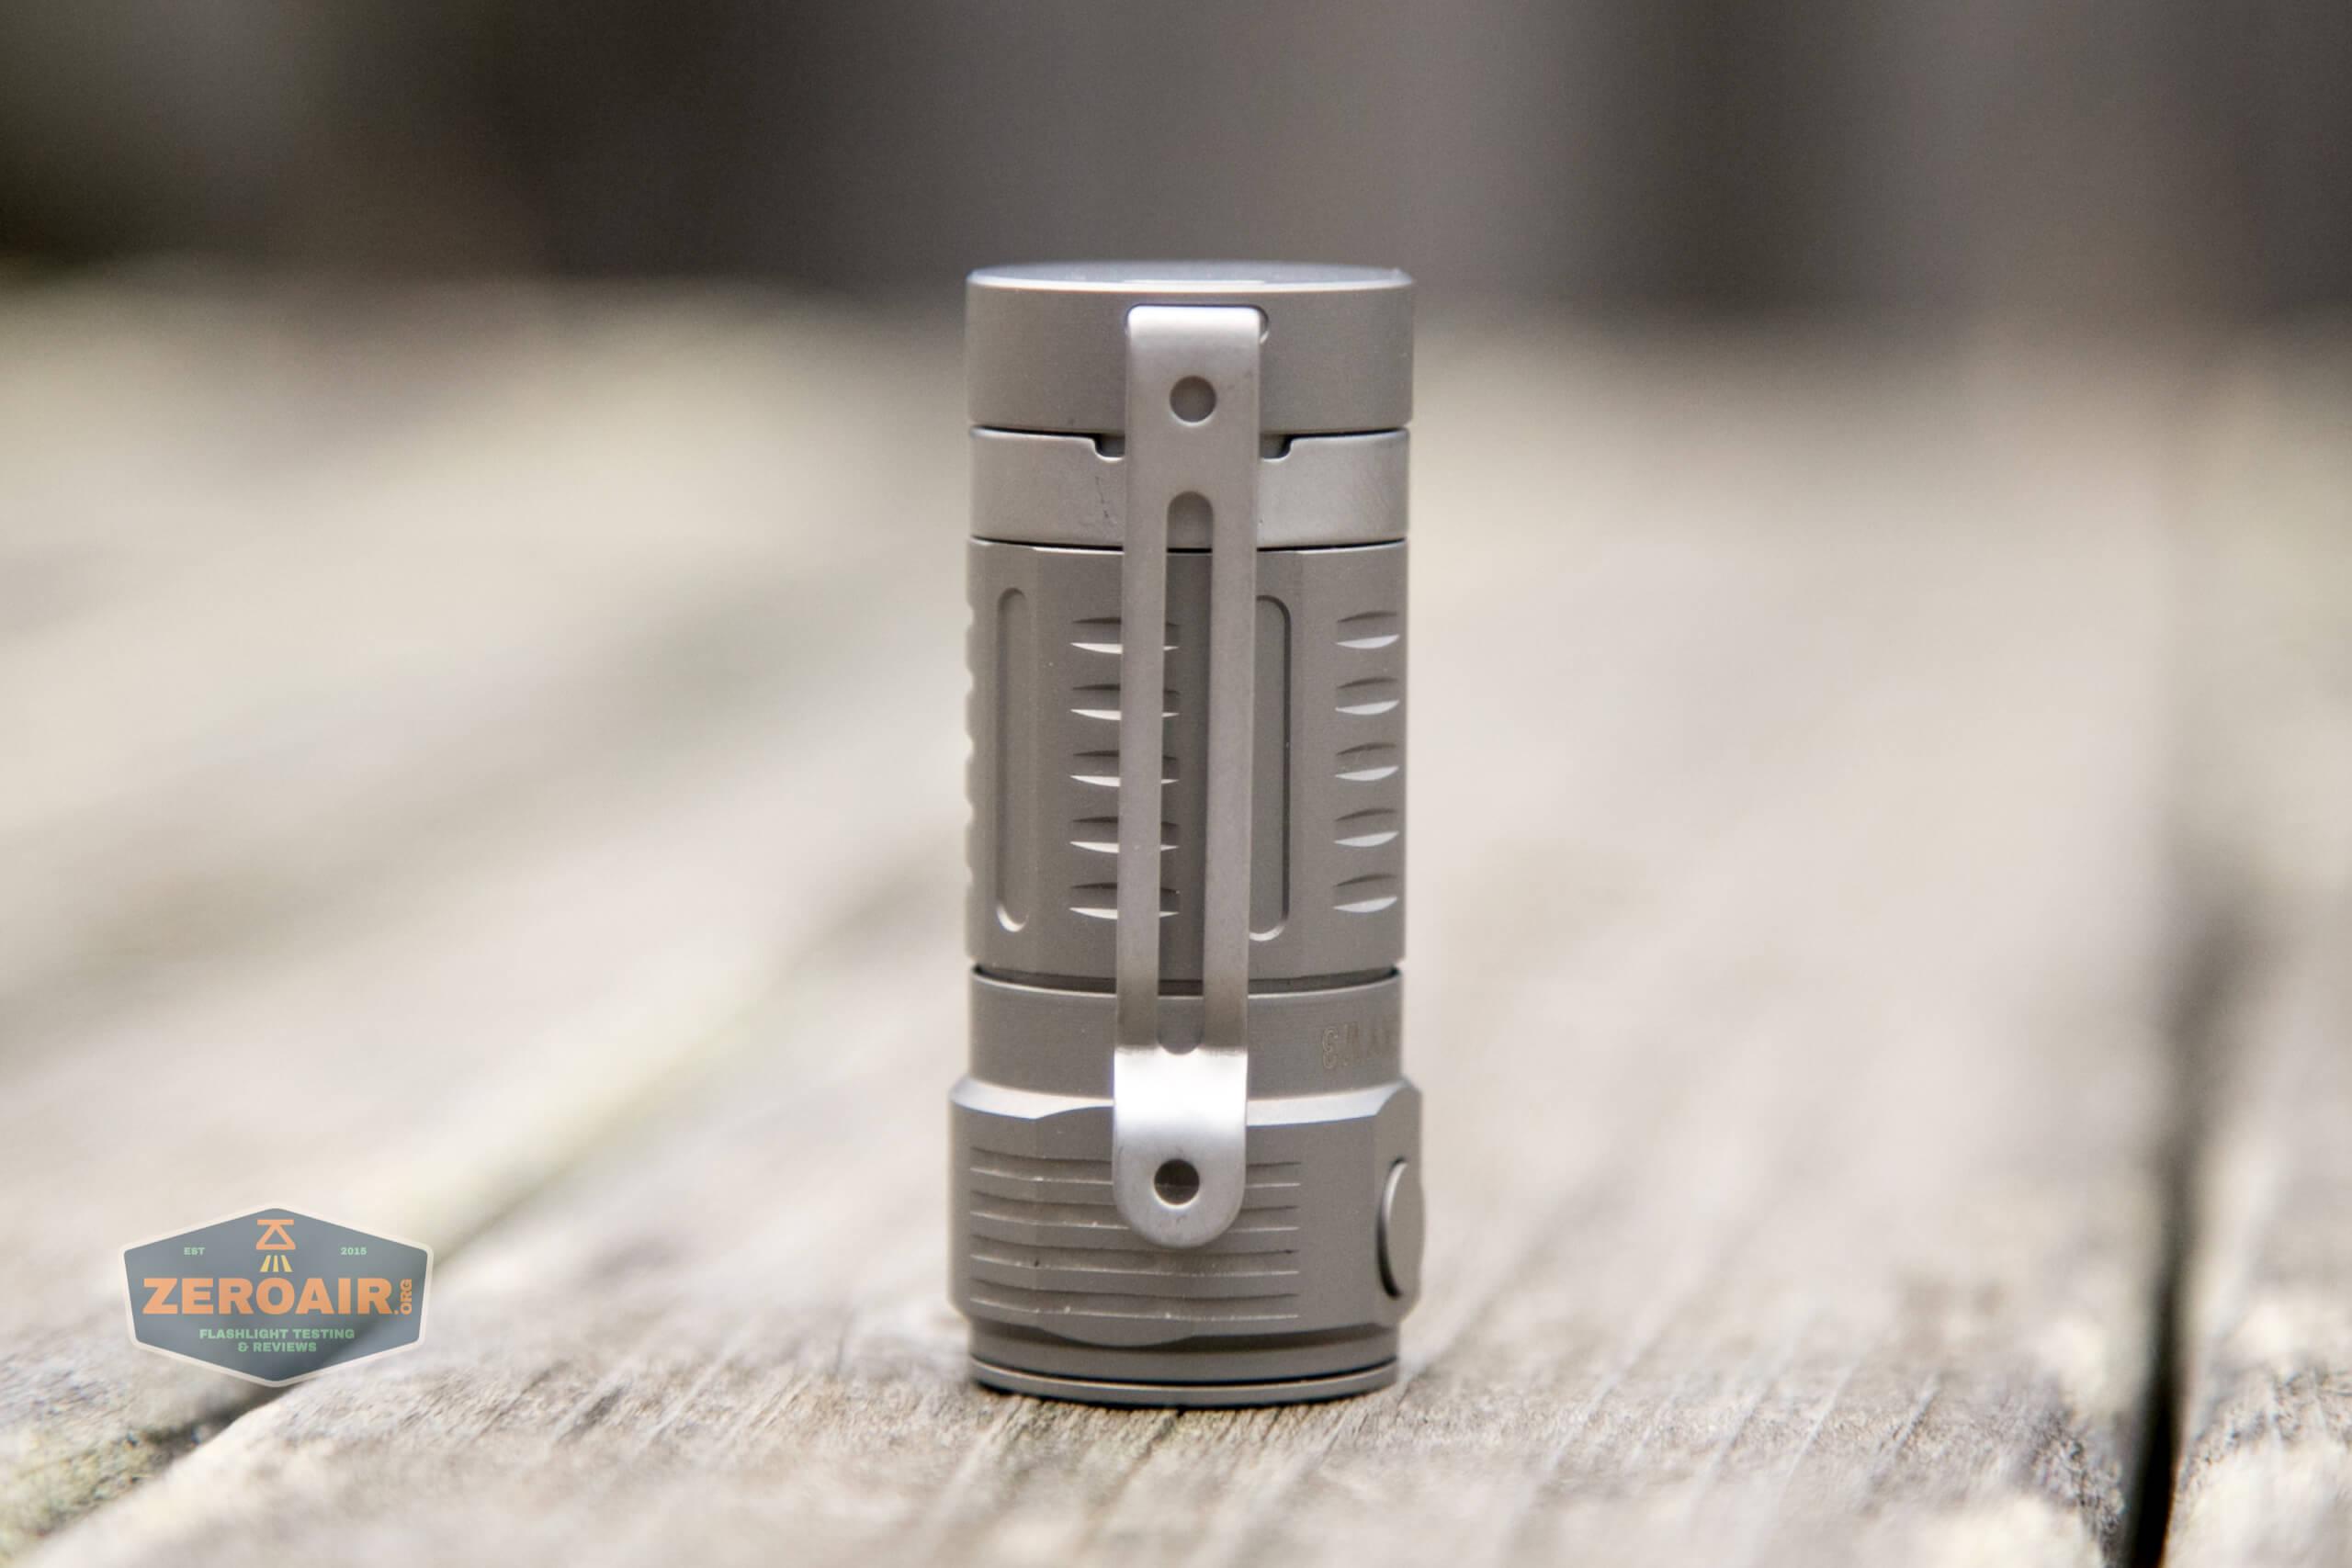 freasygears cyansky m3 titanium pocket flashlight pocket clip